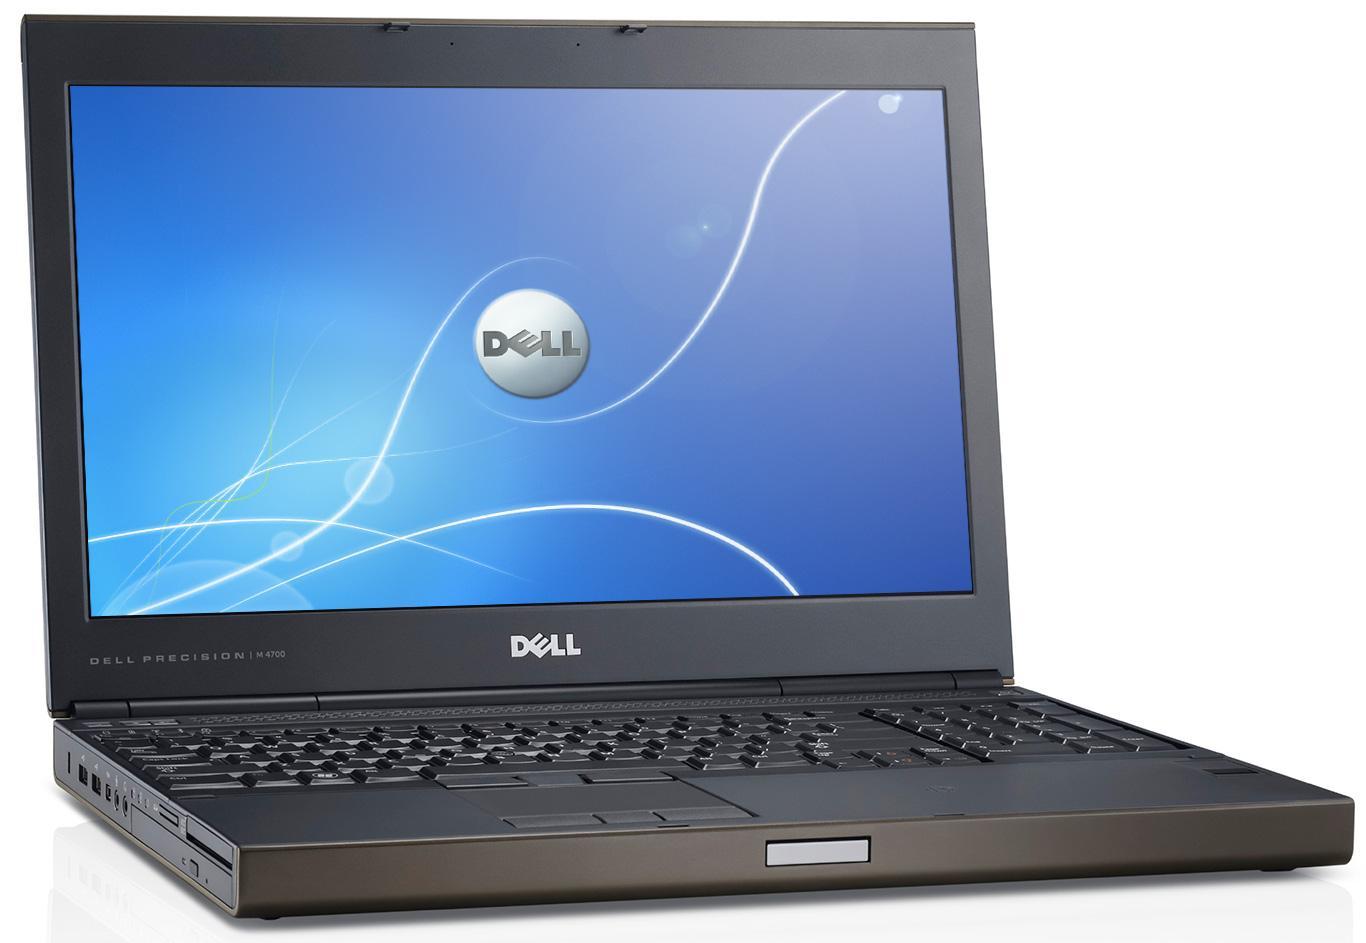 Dell Precision M4700 | Laptop Station